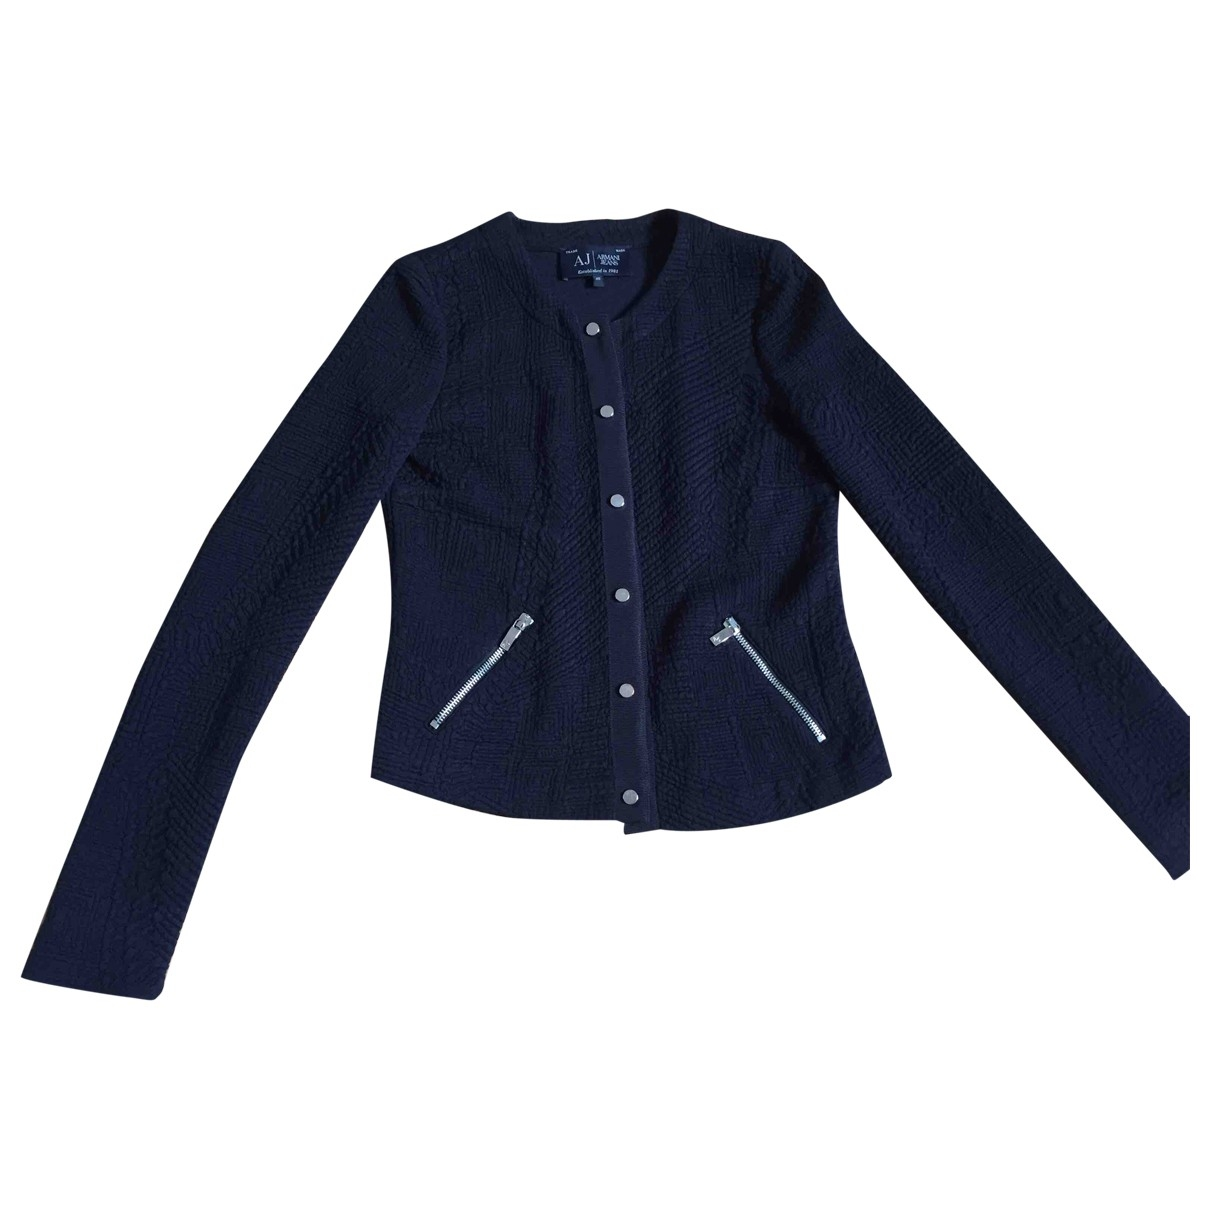 Armani Jeans \N Jacke in  Marine Synthetik